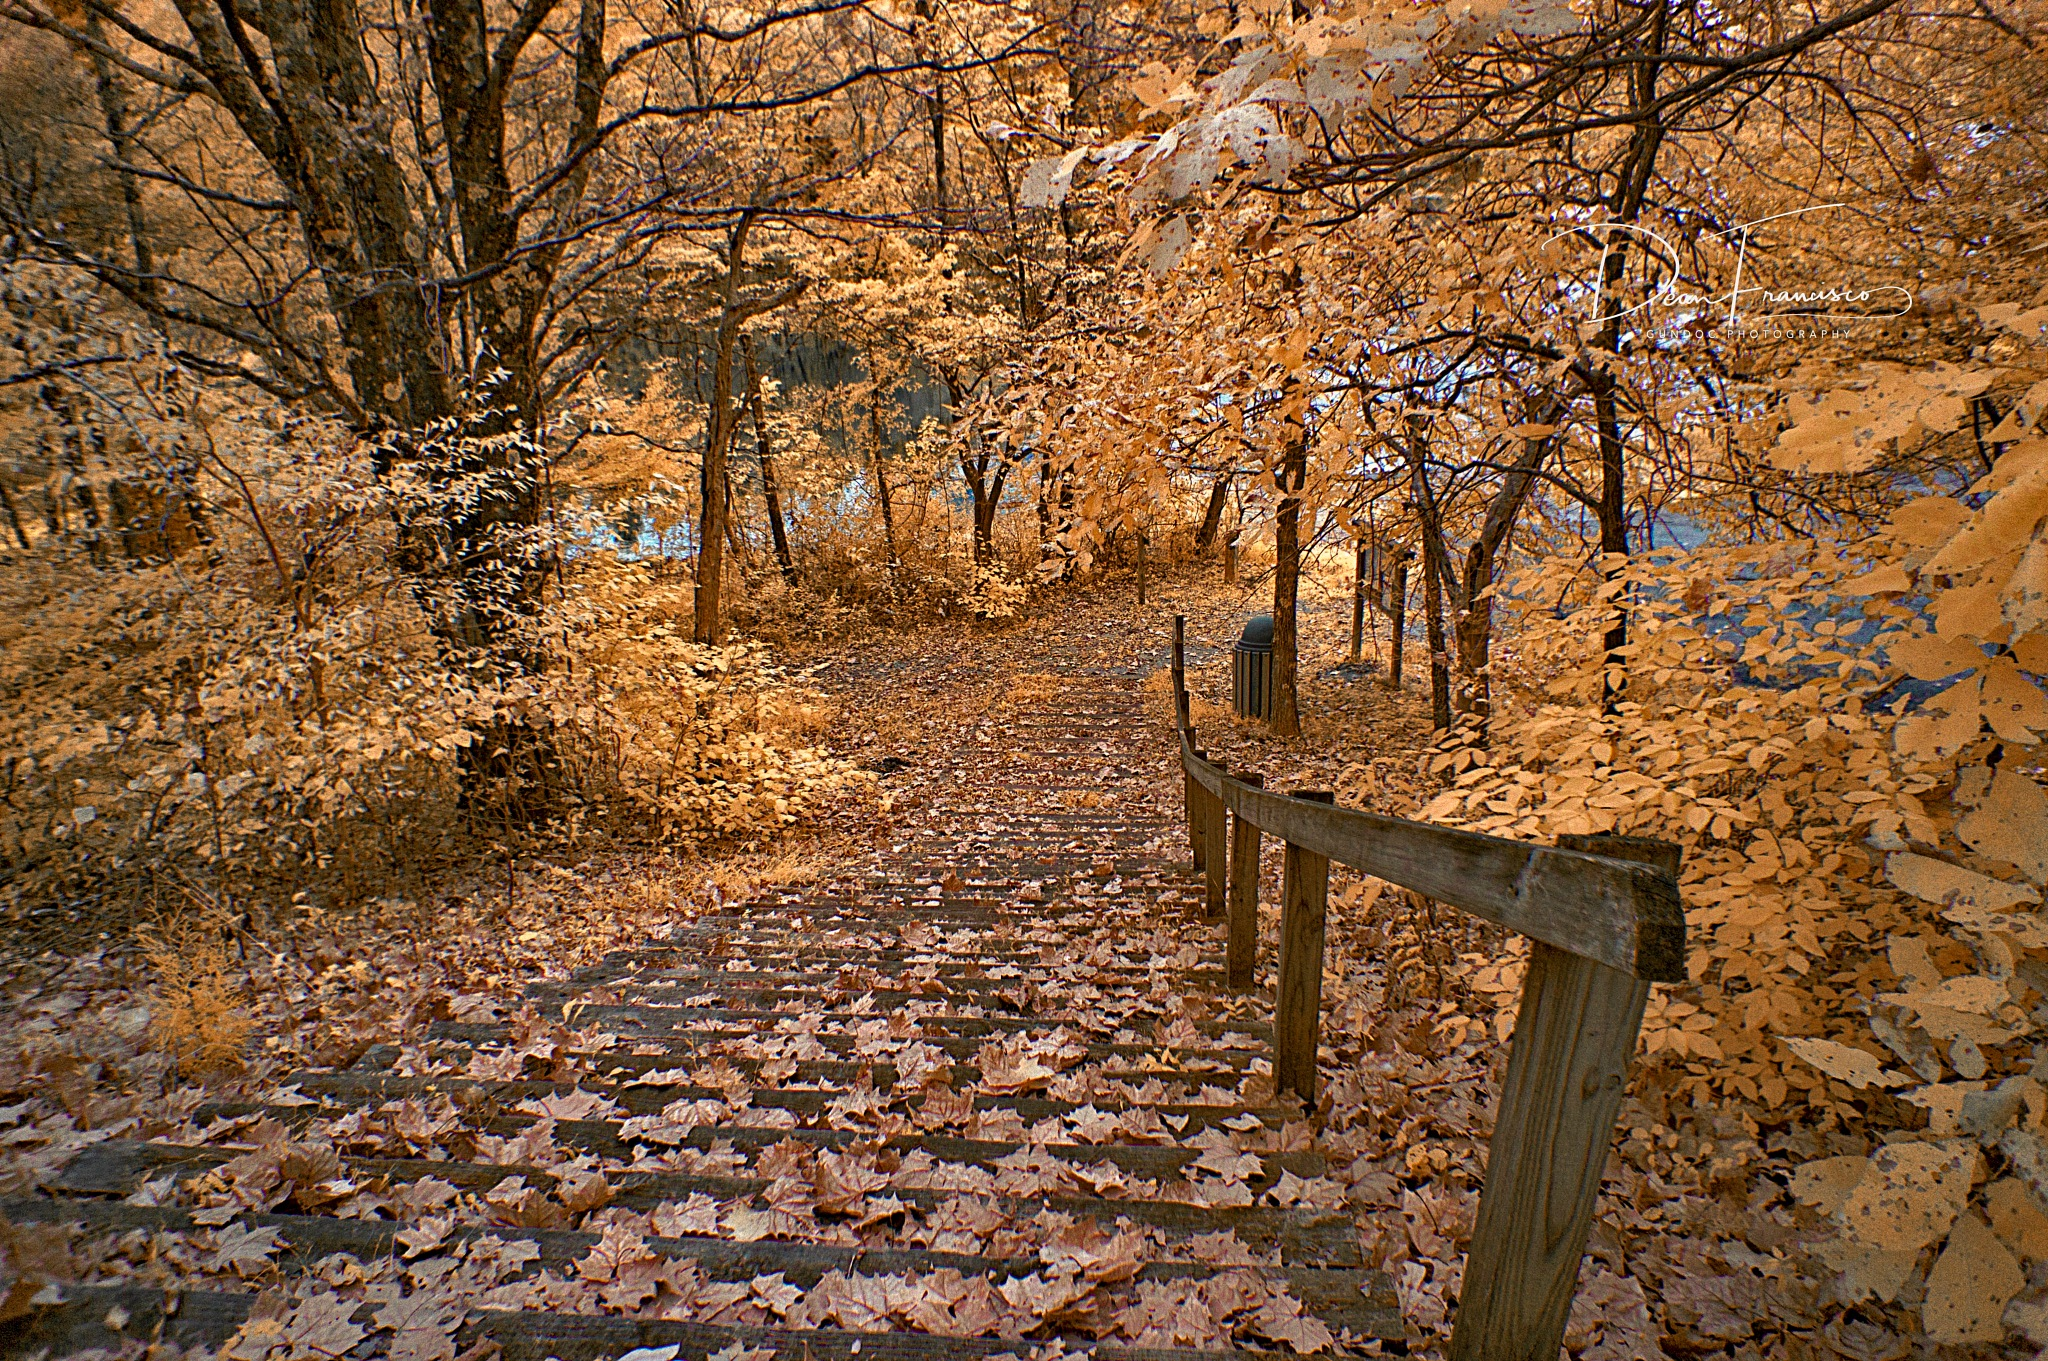 Steps down to Saddle Lake by Dean Francisco